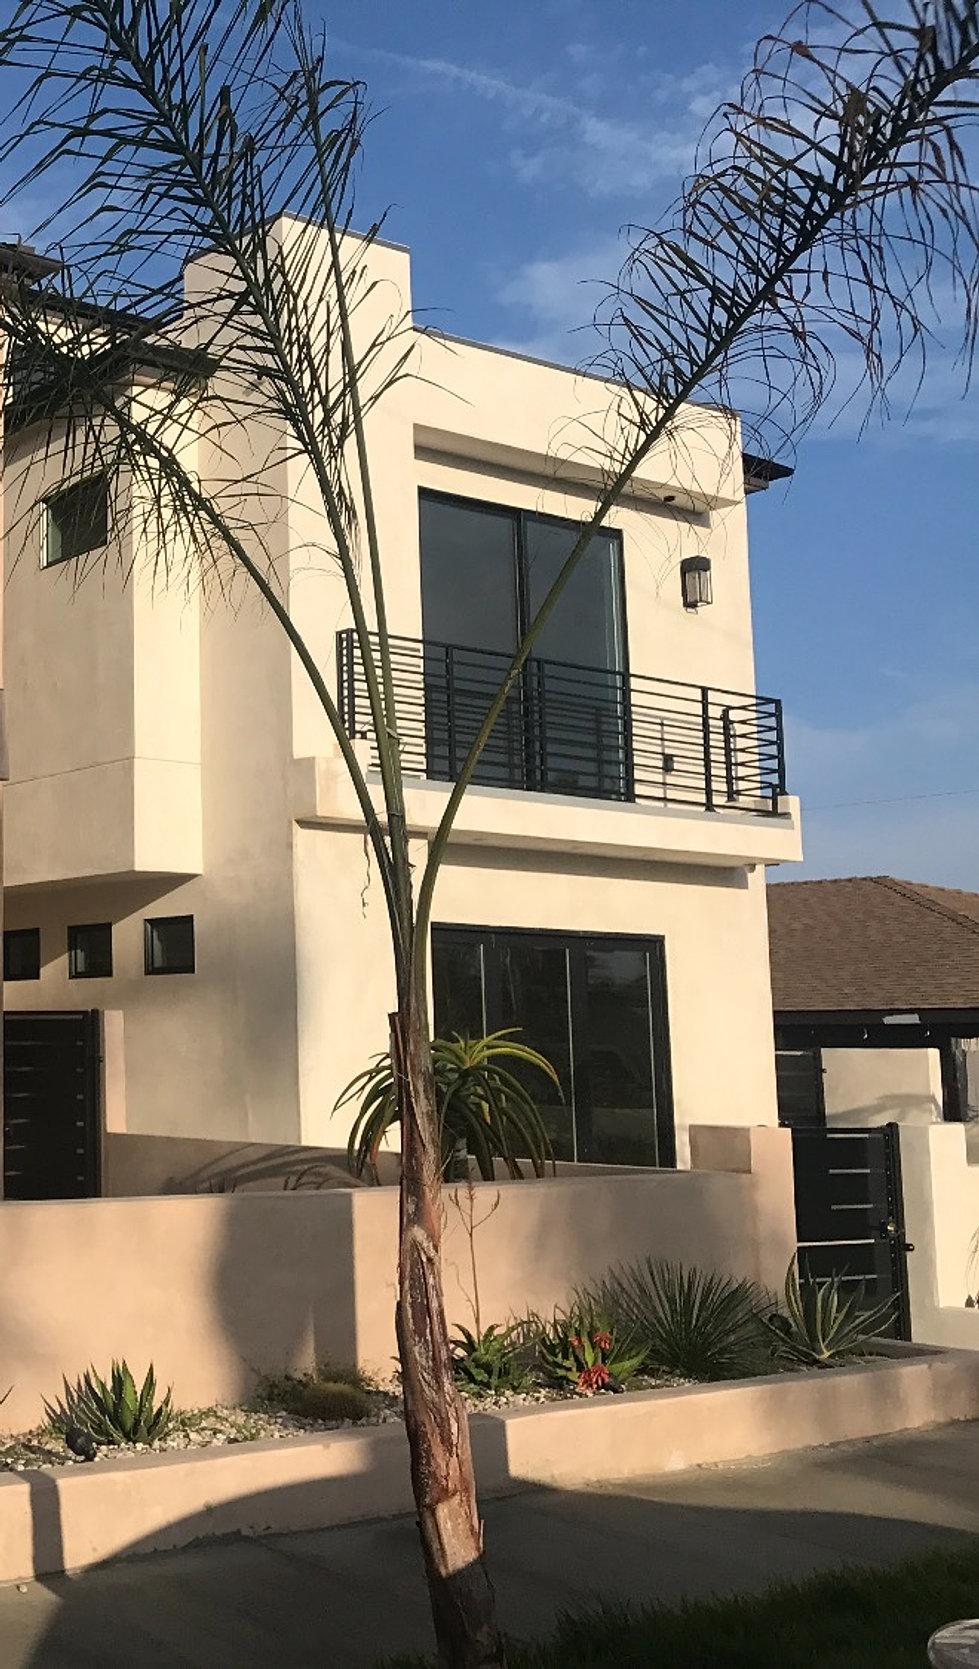 The Beach House HB